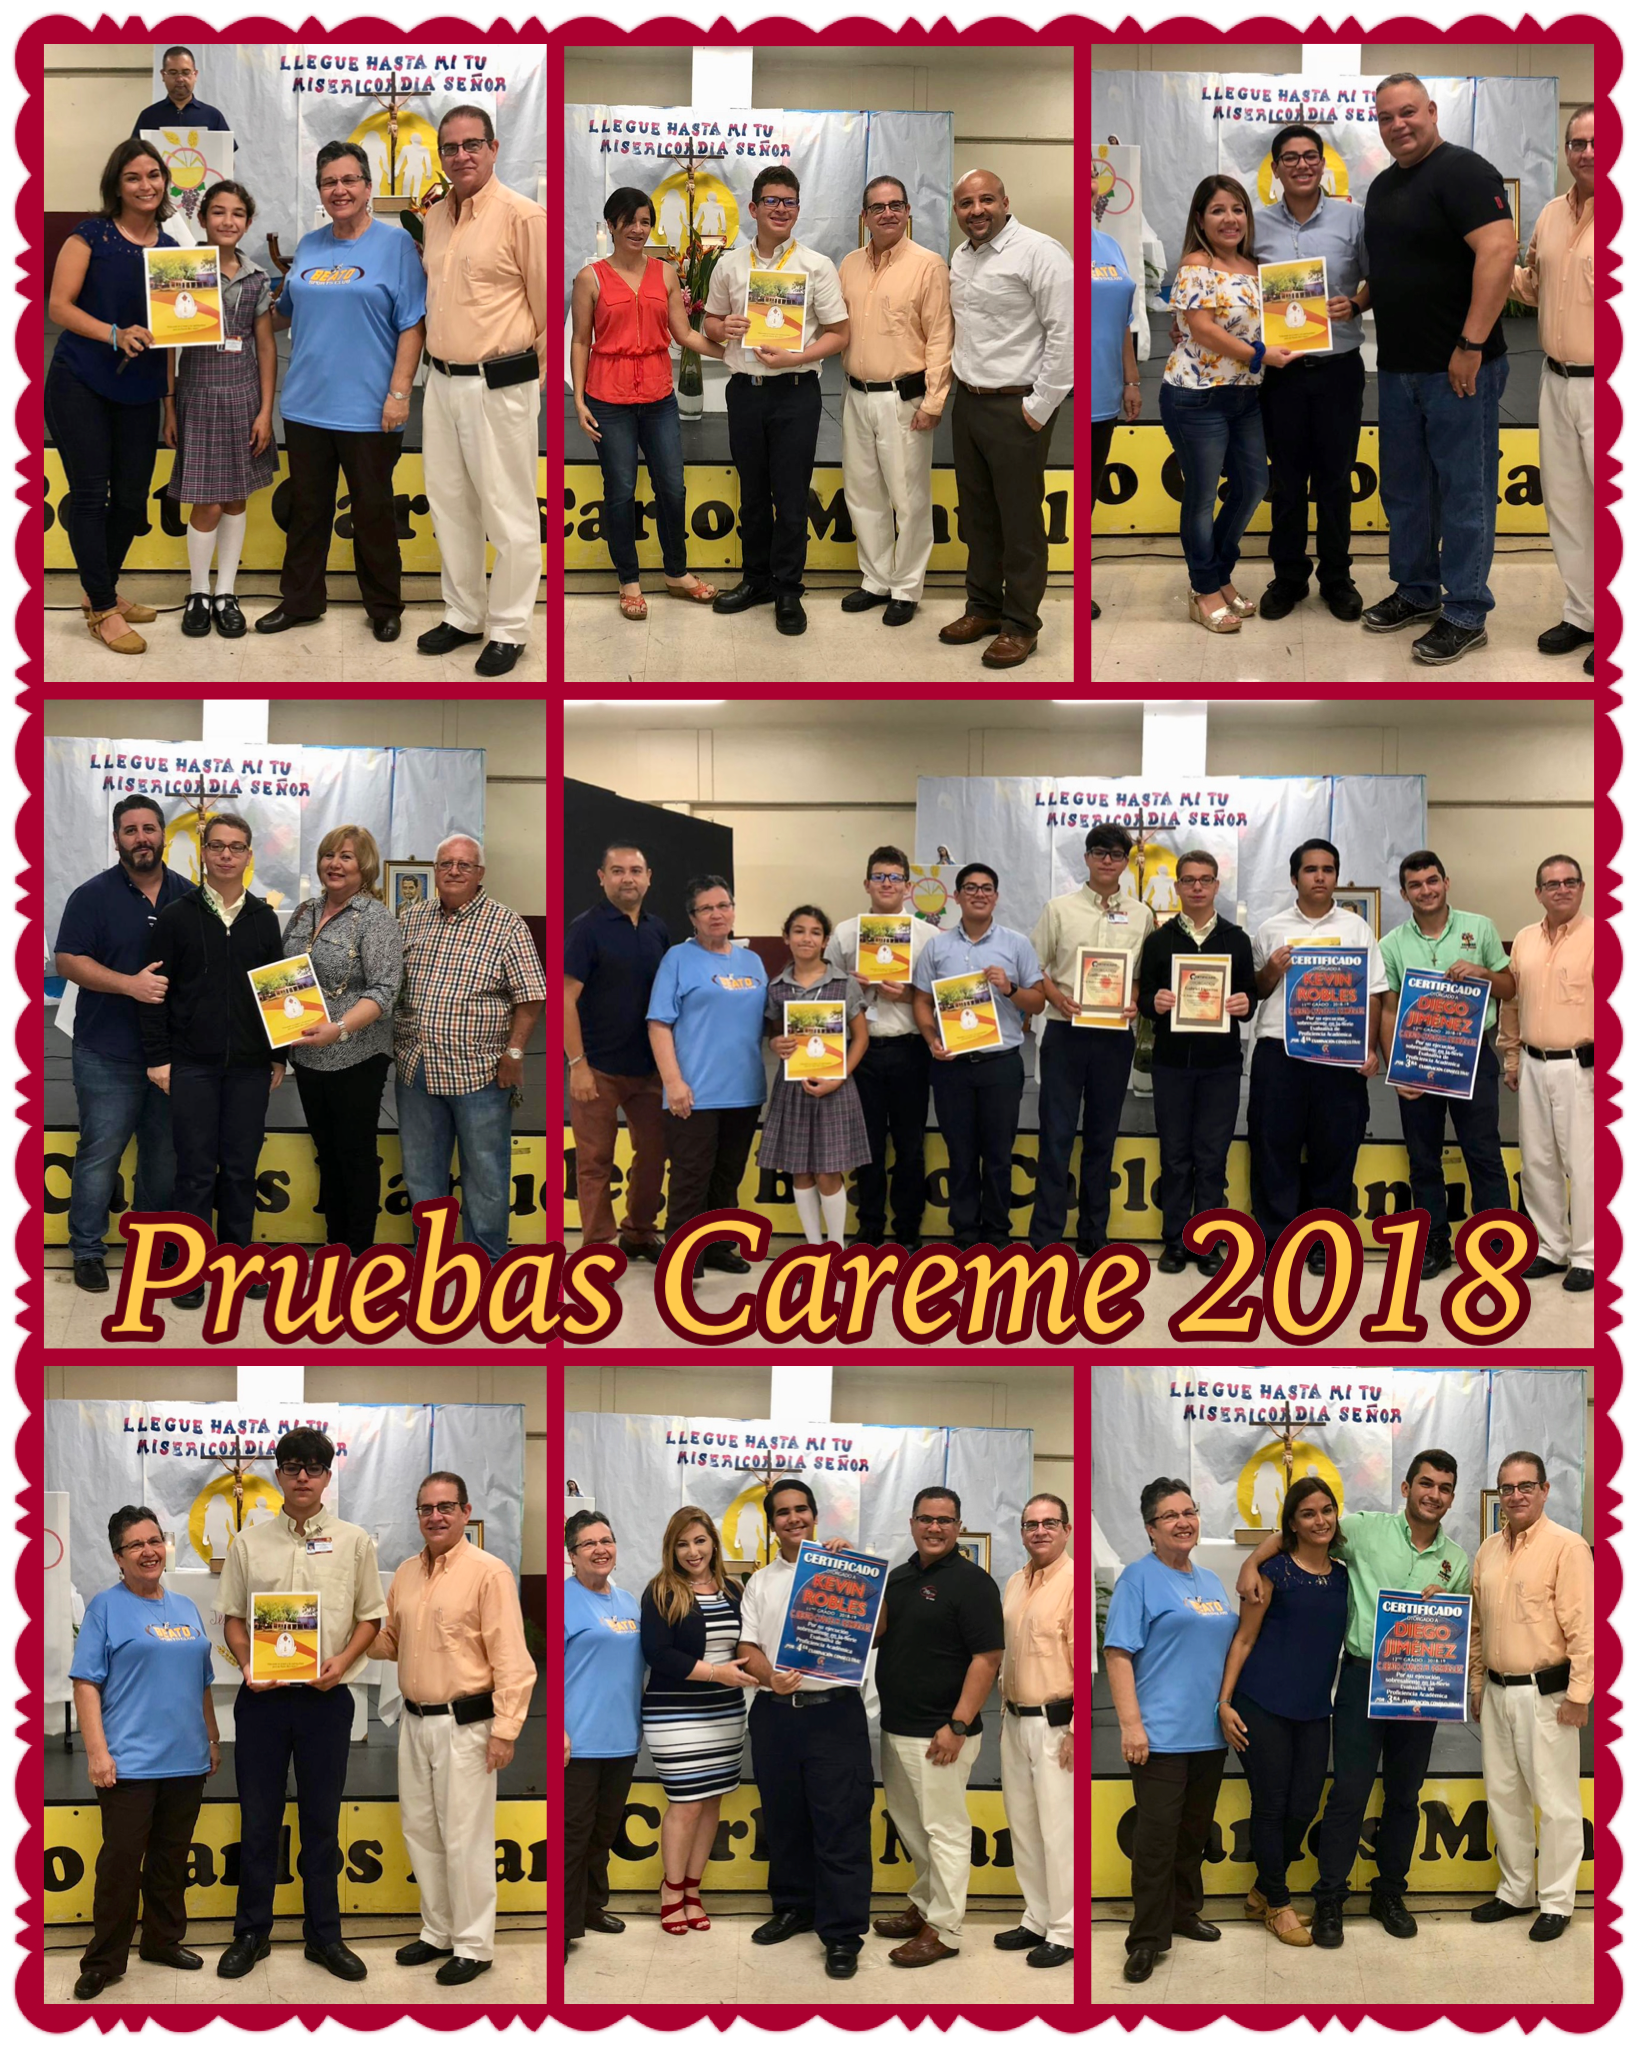 Estudiantes sobresalientes Careme 2018